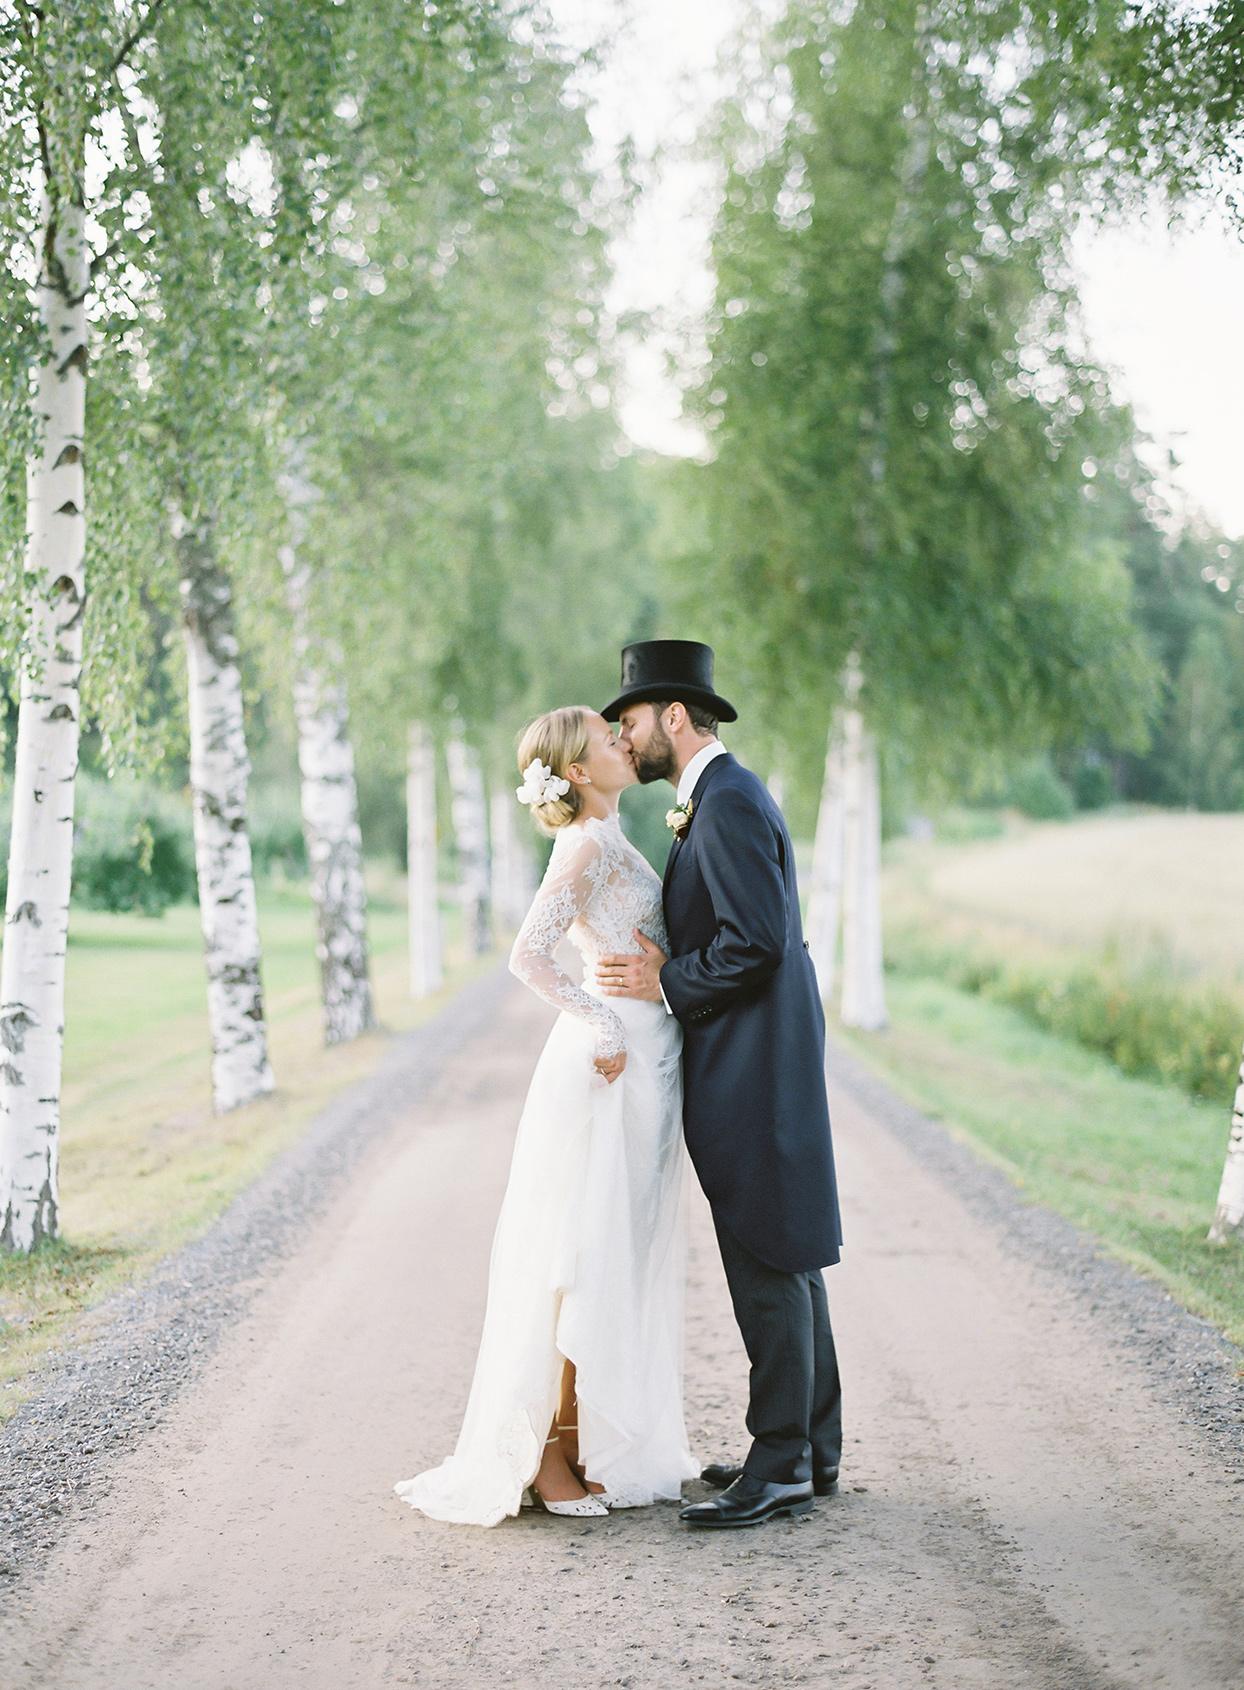 laura alexander wedding couple on dirt road